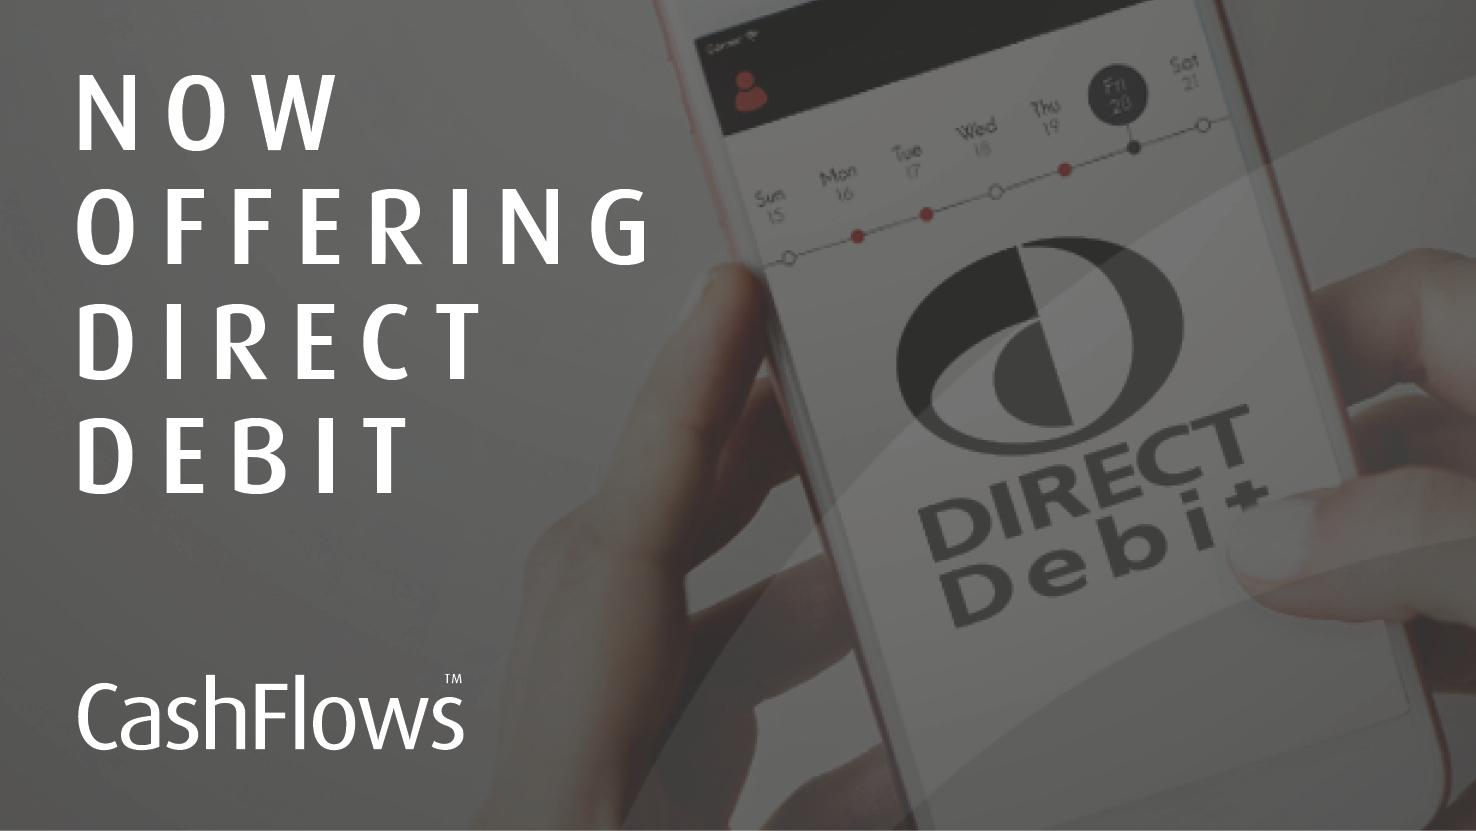 CashFlows: Now Offering Direct Debit